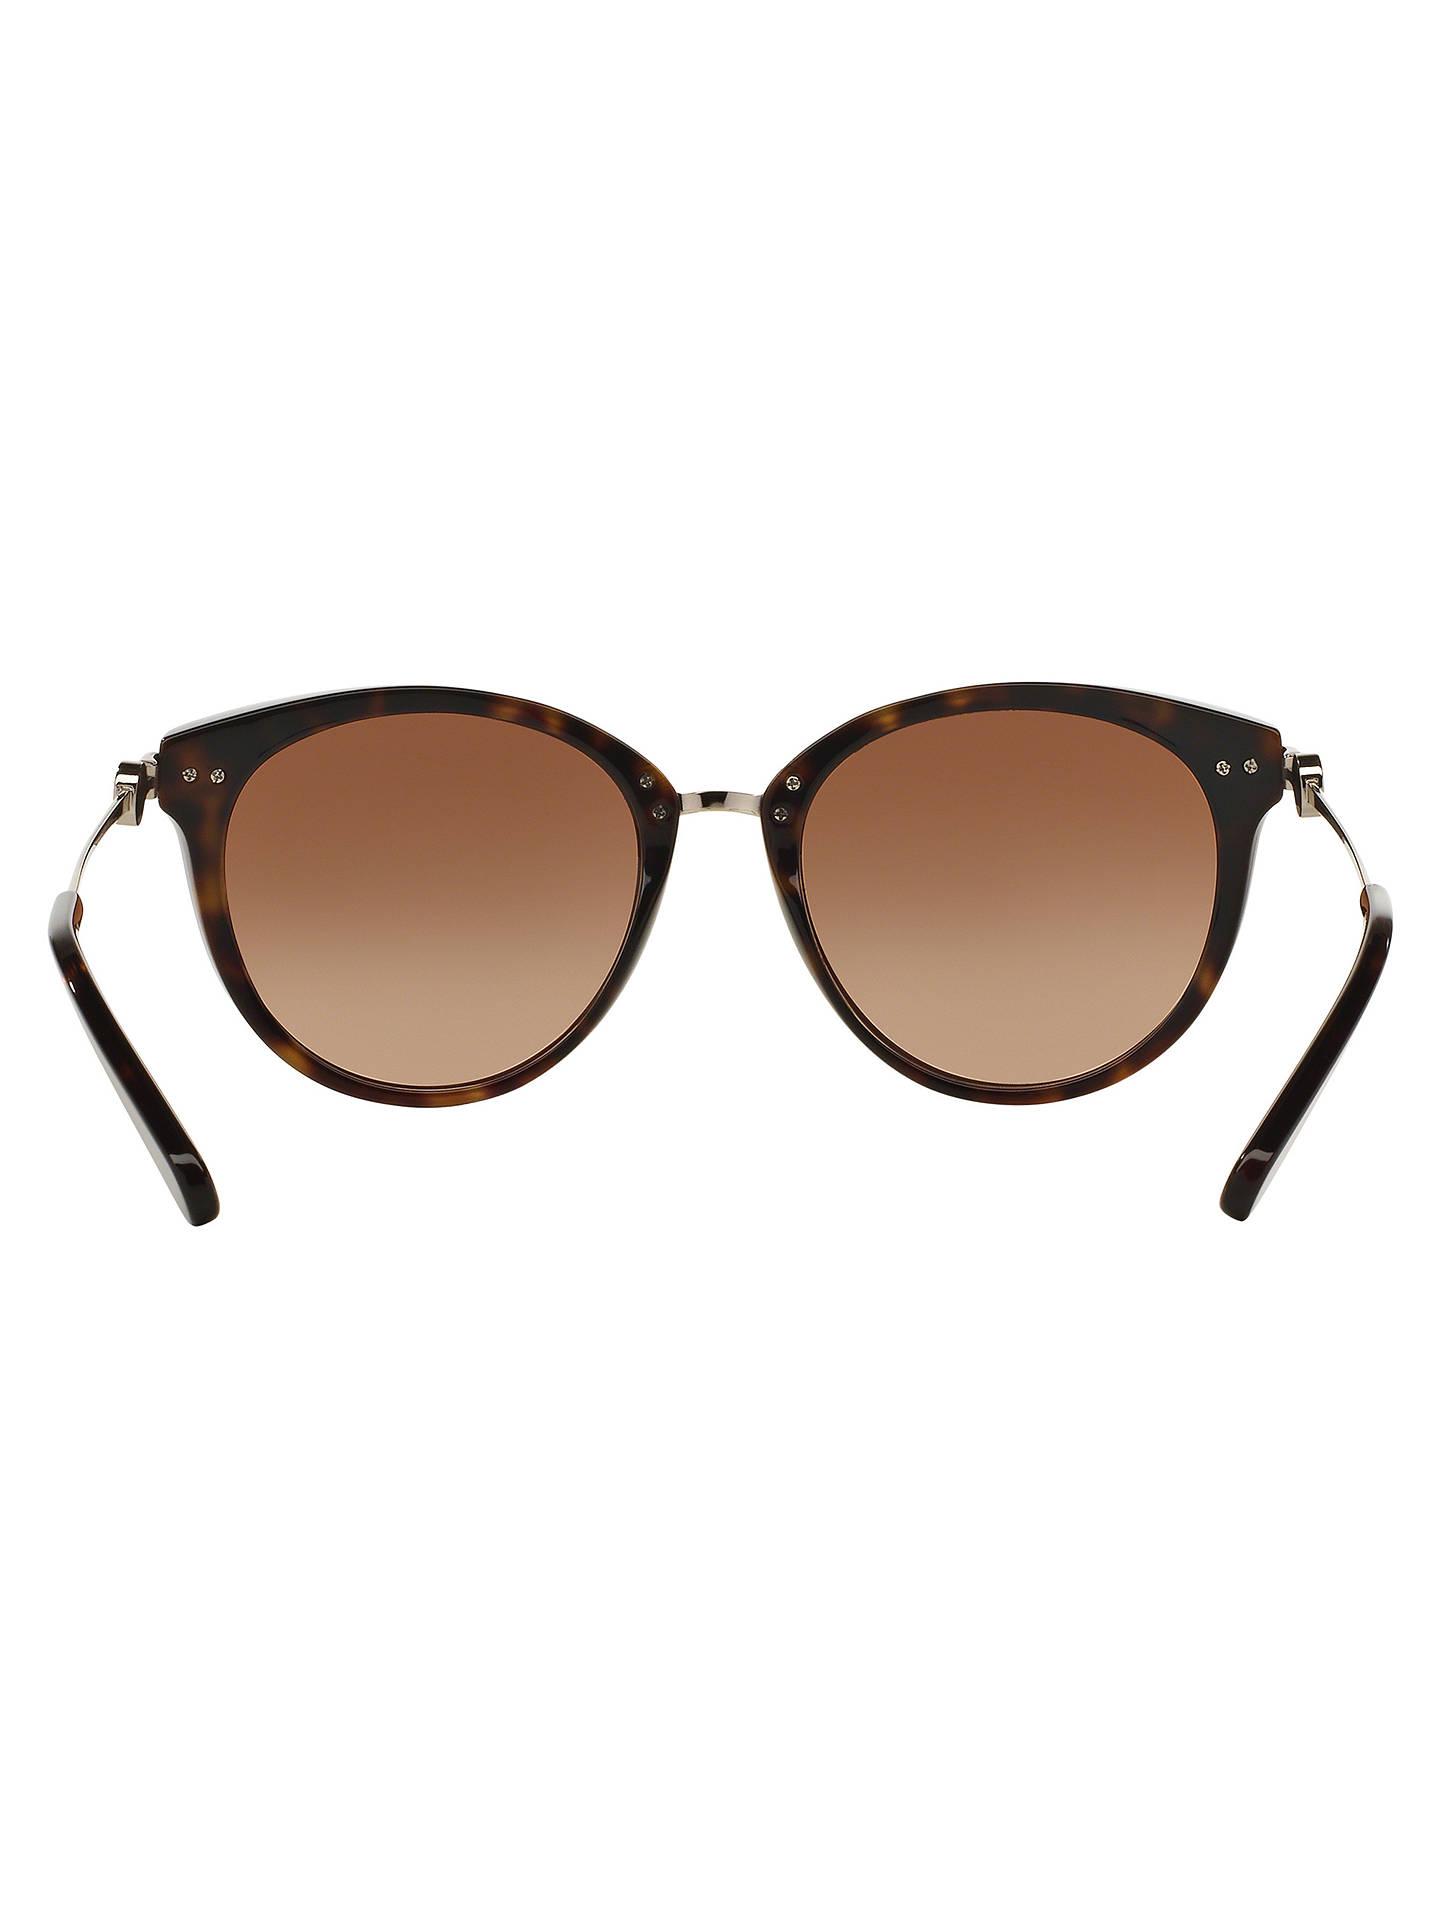 ecd17724e28c2 ... Buy Michael Kors MK6040 Abela III Round Sunglasses